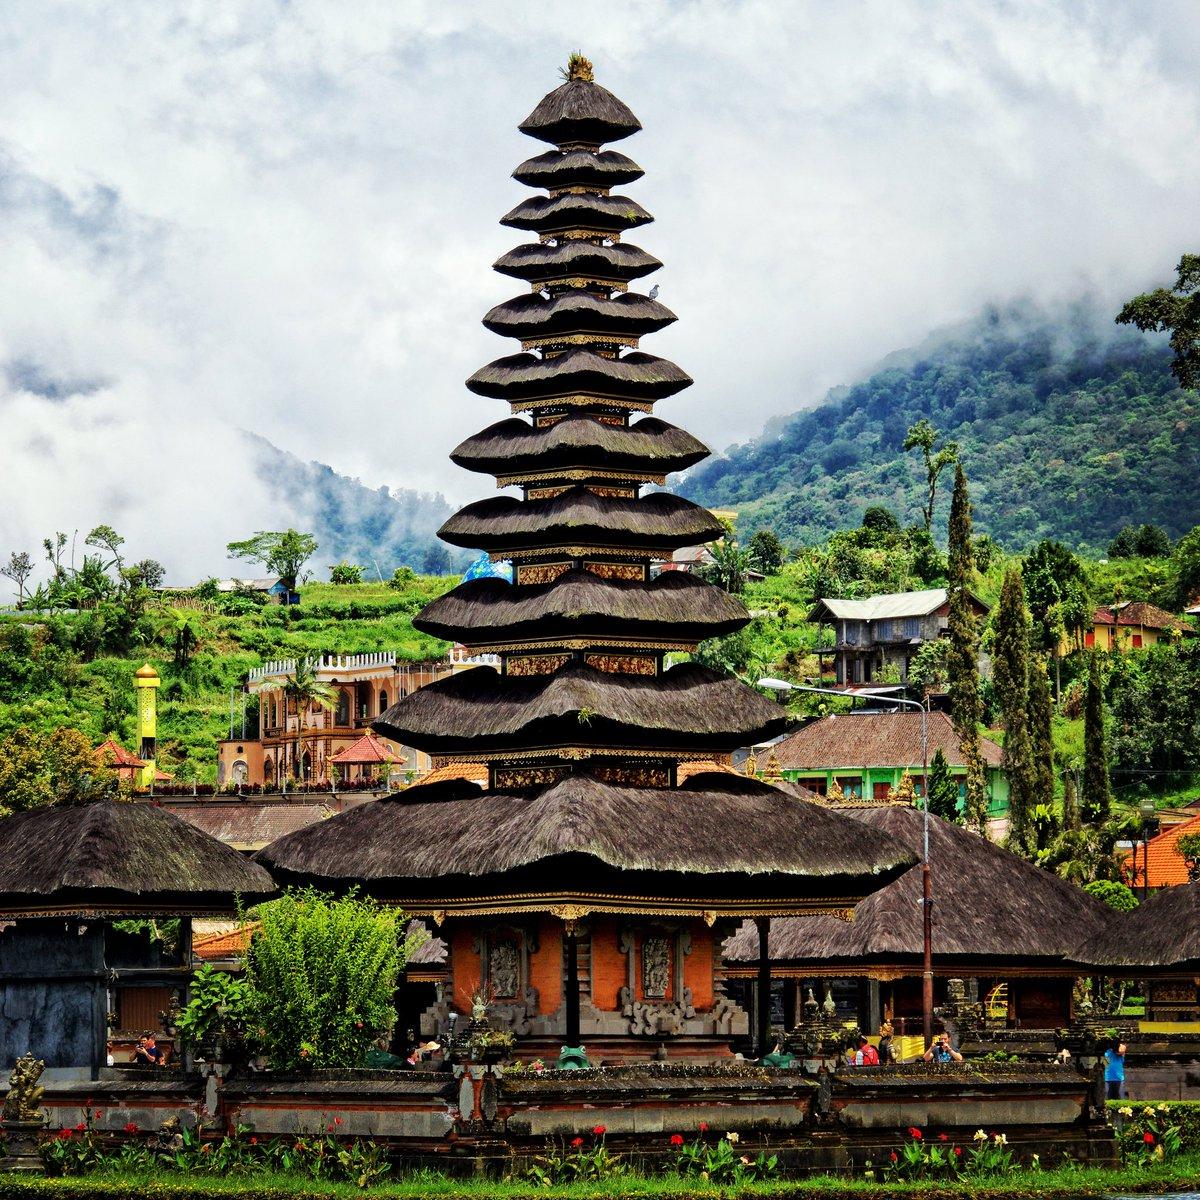 Ulun Danu Beratan Temple, Indonesia #WeAreKuruWe #travelcommunity #travel #travelphotography #travelphoto #traveltheworld  #nextdestination #wanderlust #budgettravel #washyourhands #island #indonesia #bali #temple #coastalliving #startup #crewlife #retweet #follobackinstantlypic.twitter.com/EH3Ml8SC7X